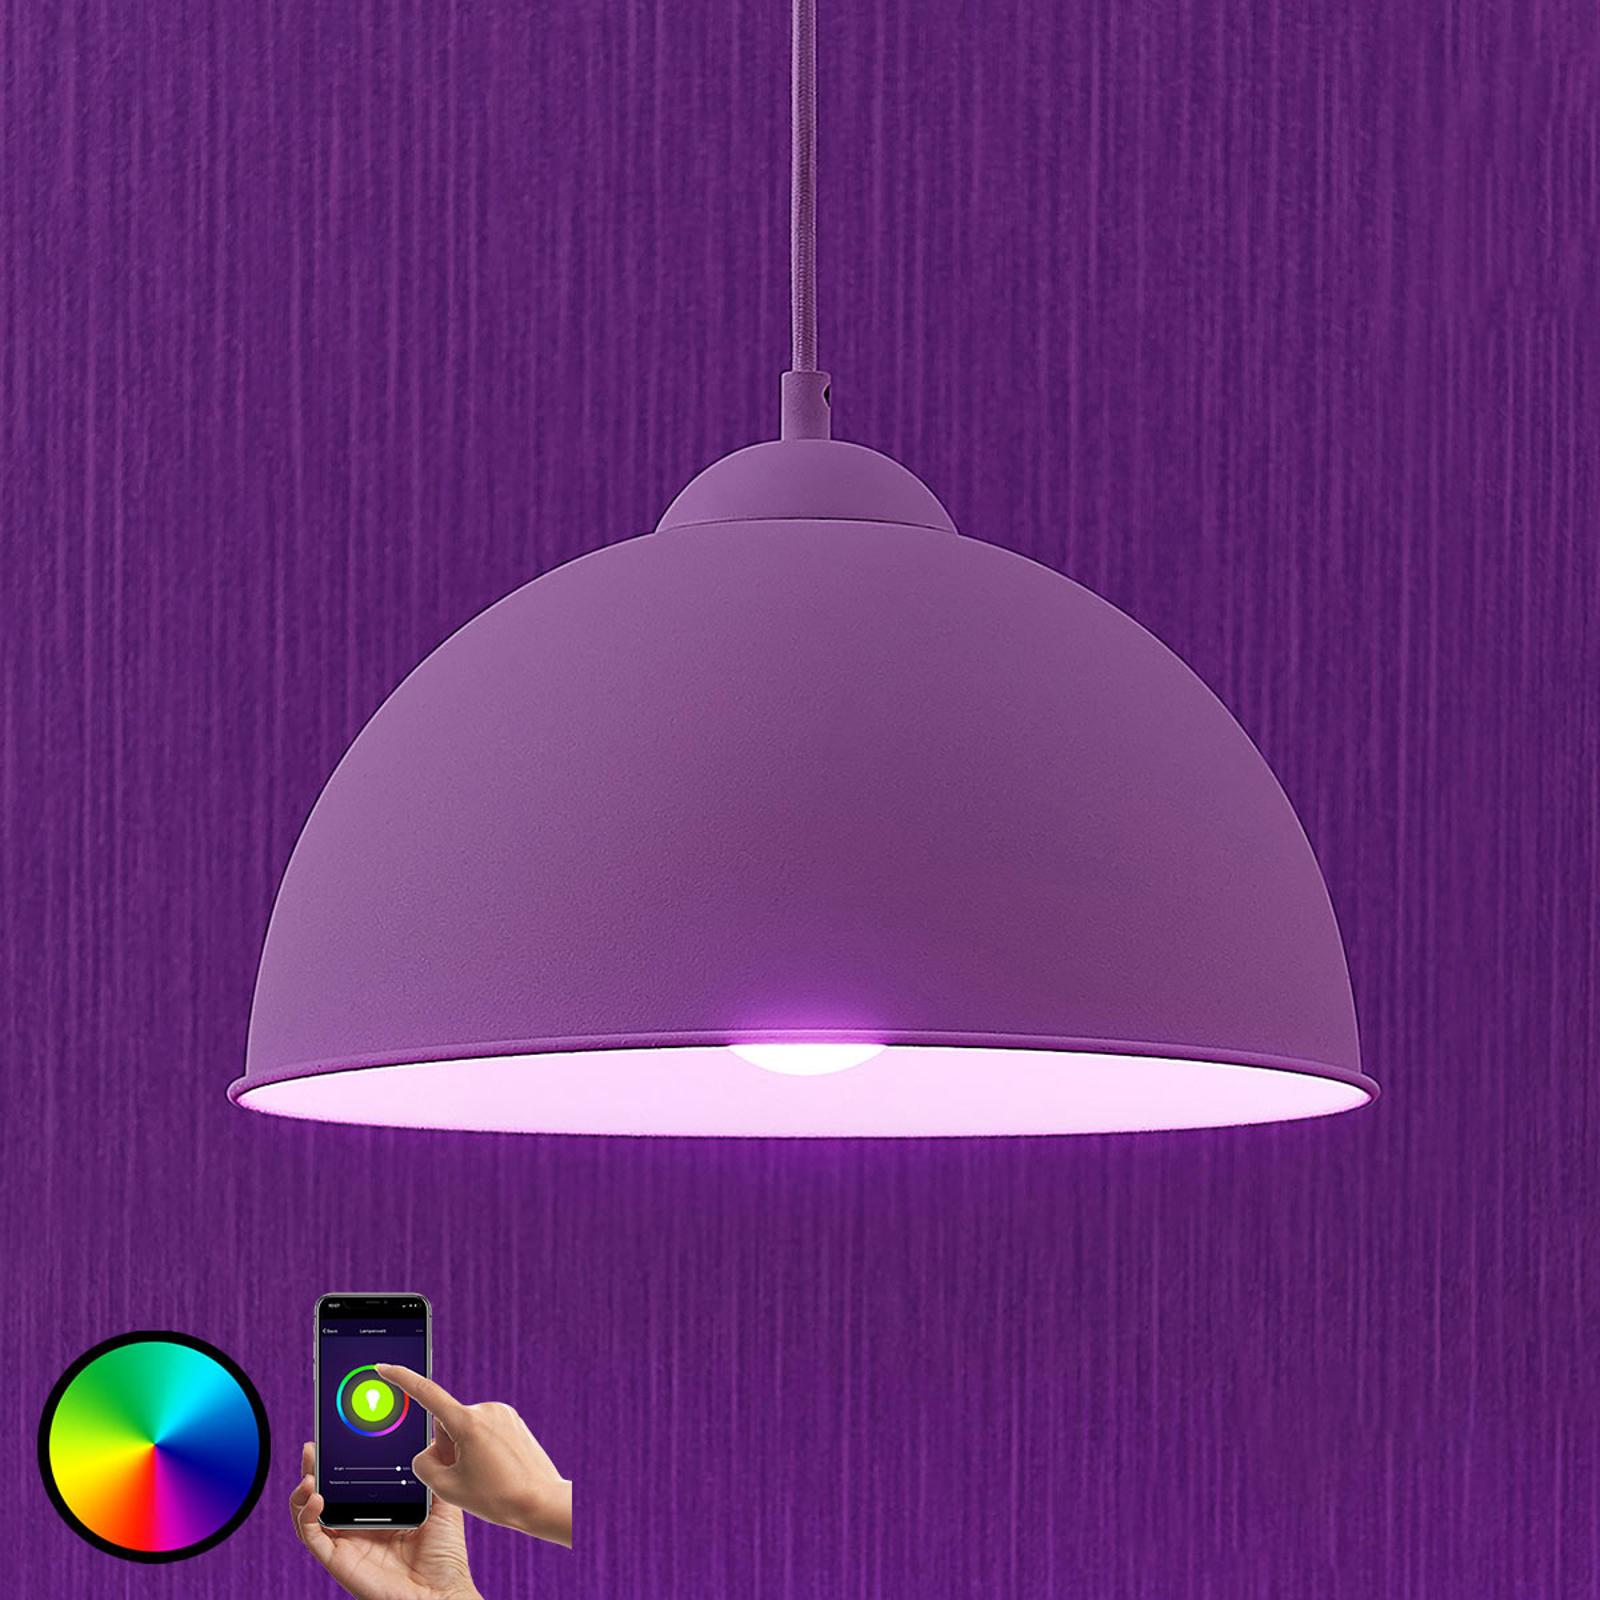 Lampa wisząca LED Bowl WiFi 31cm biała